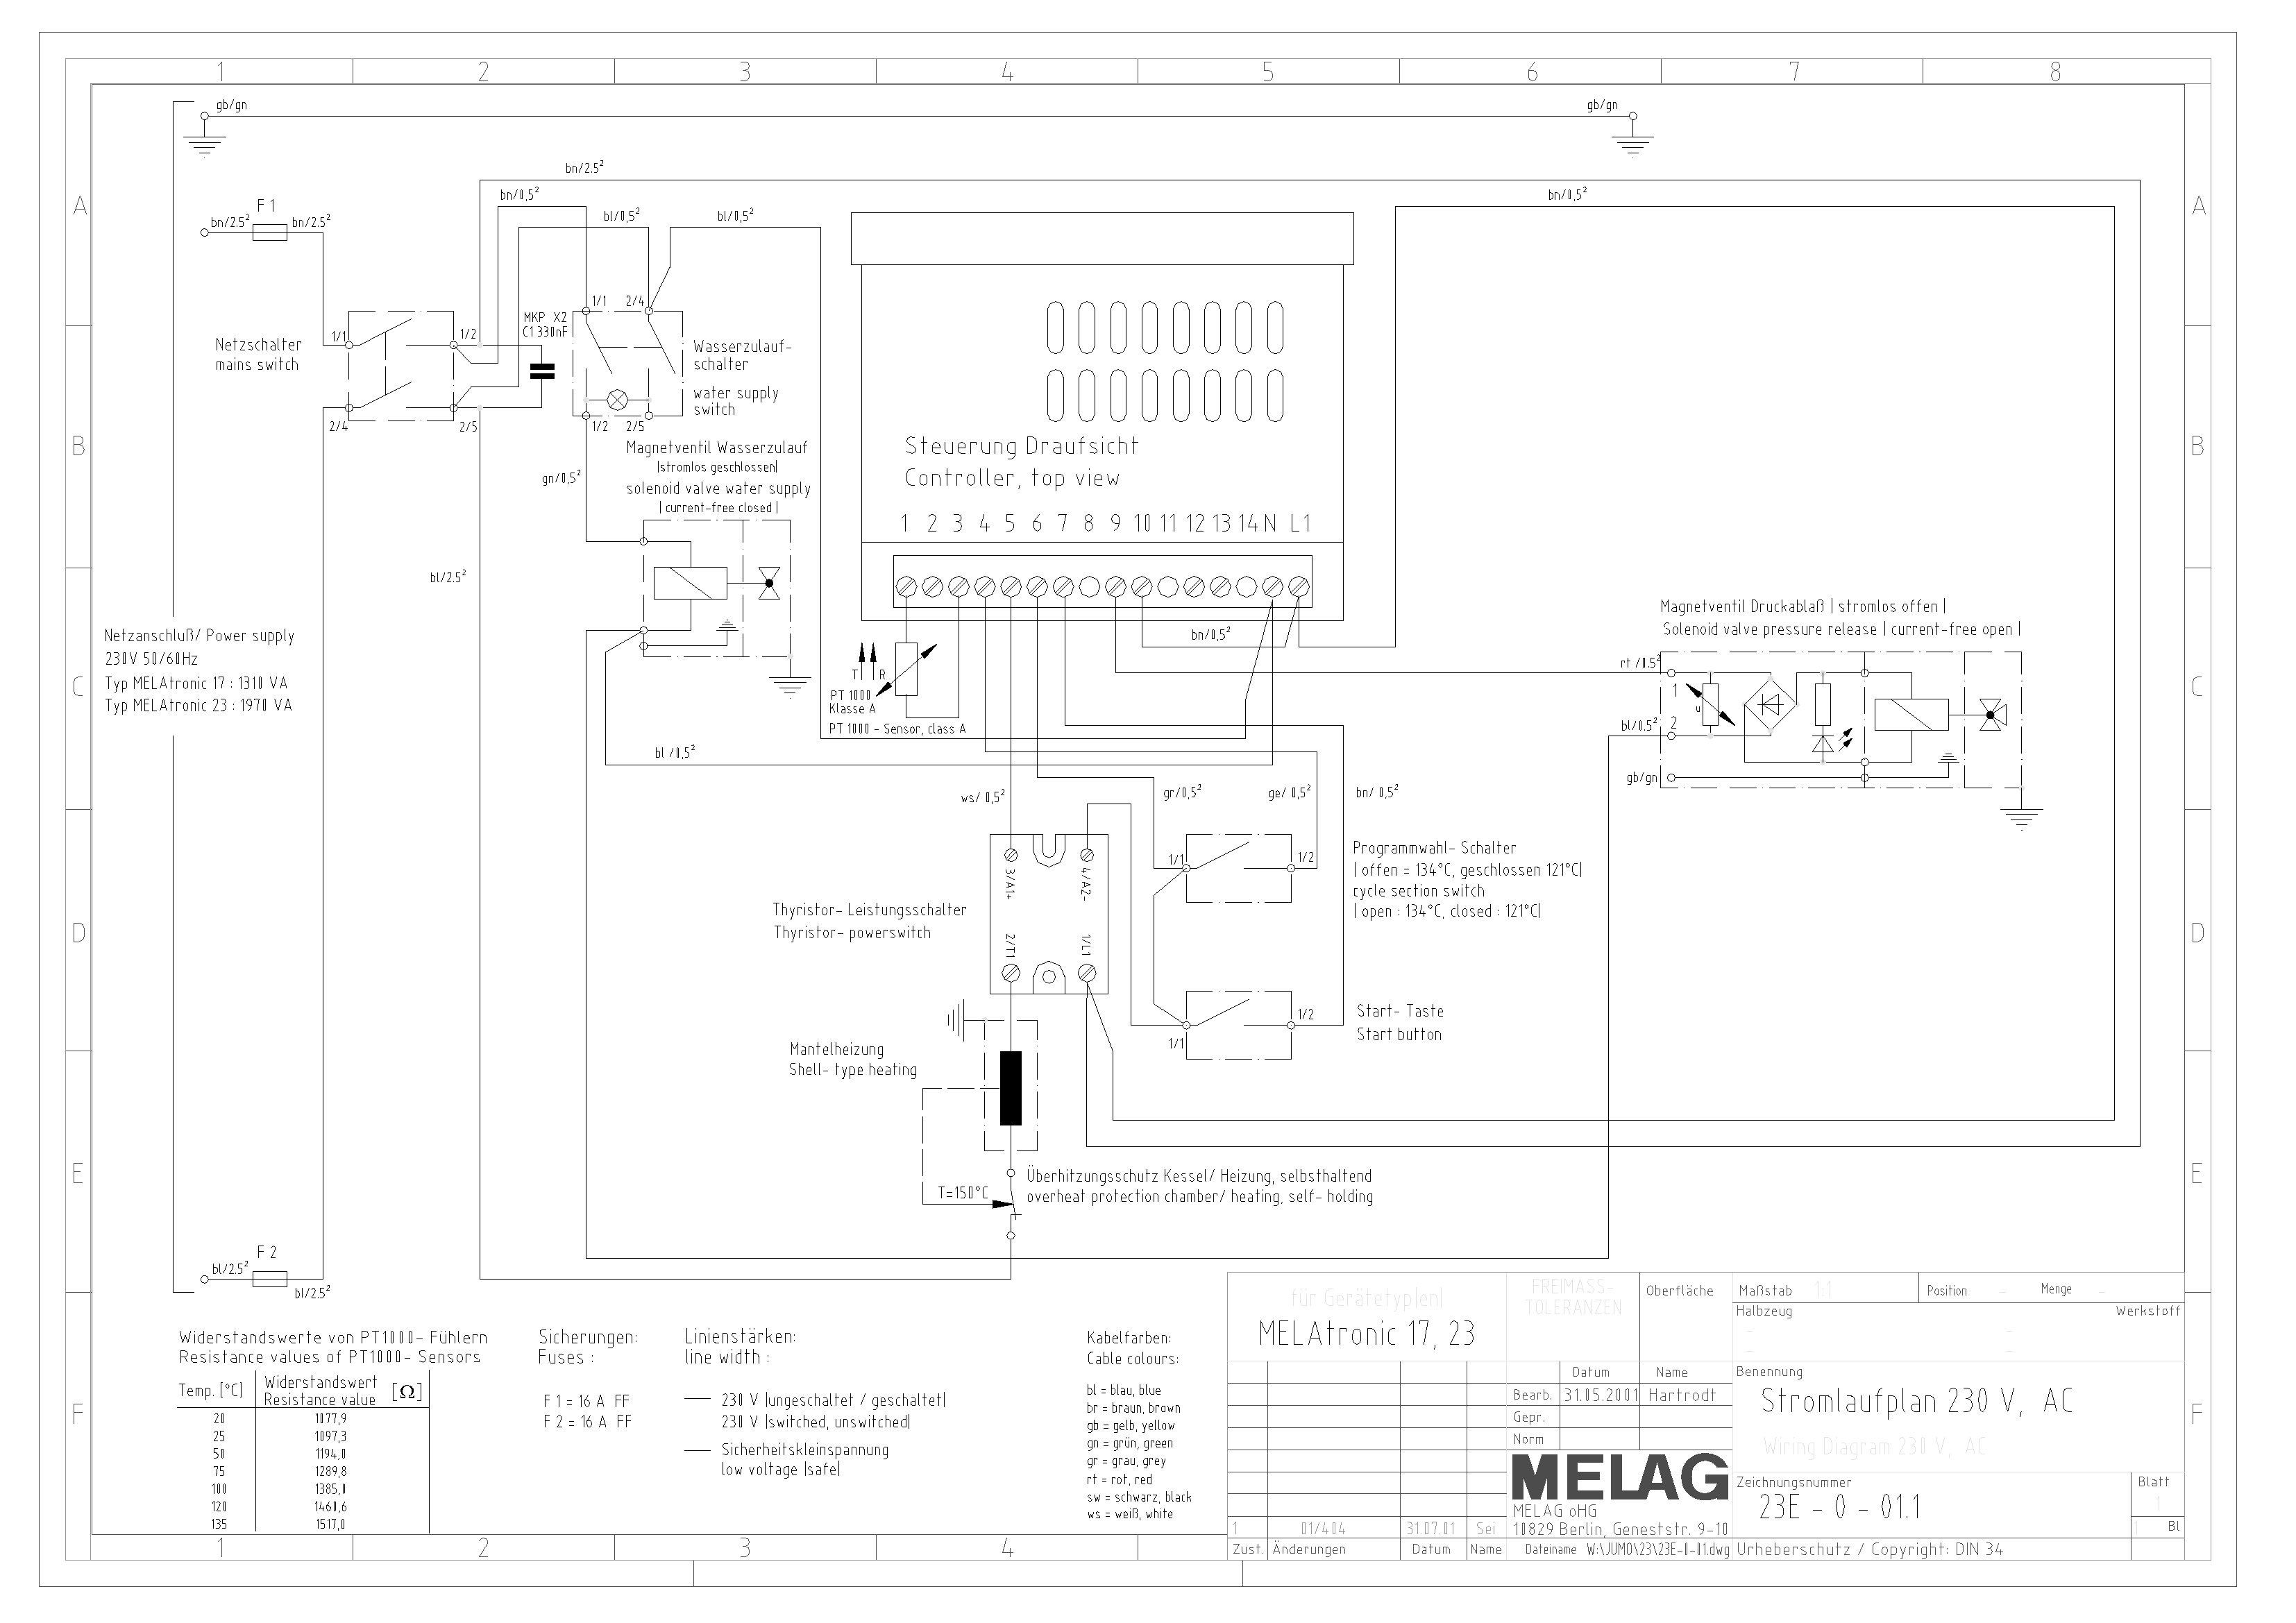 midmark autoclave m11 wiring diagram